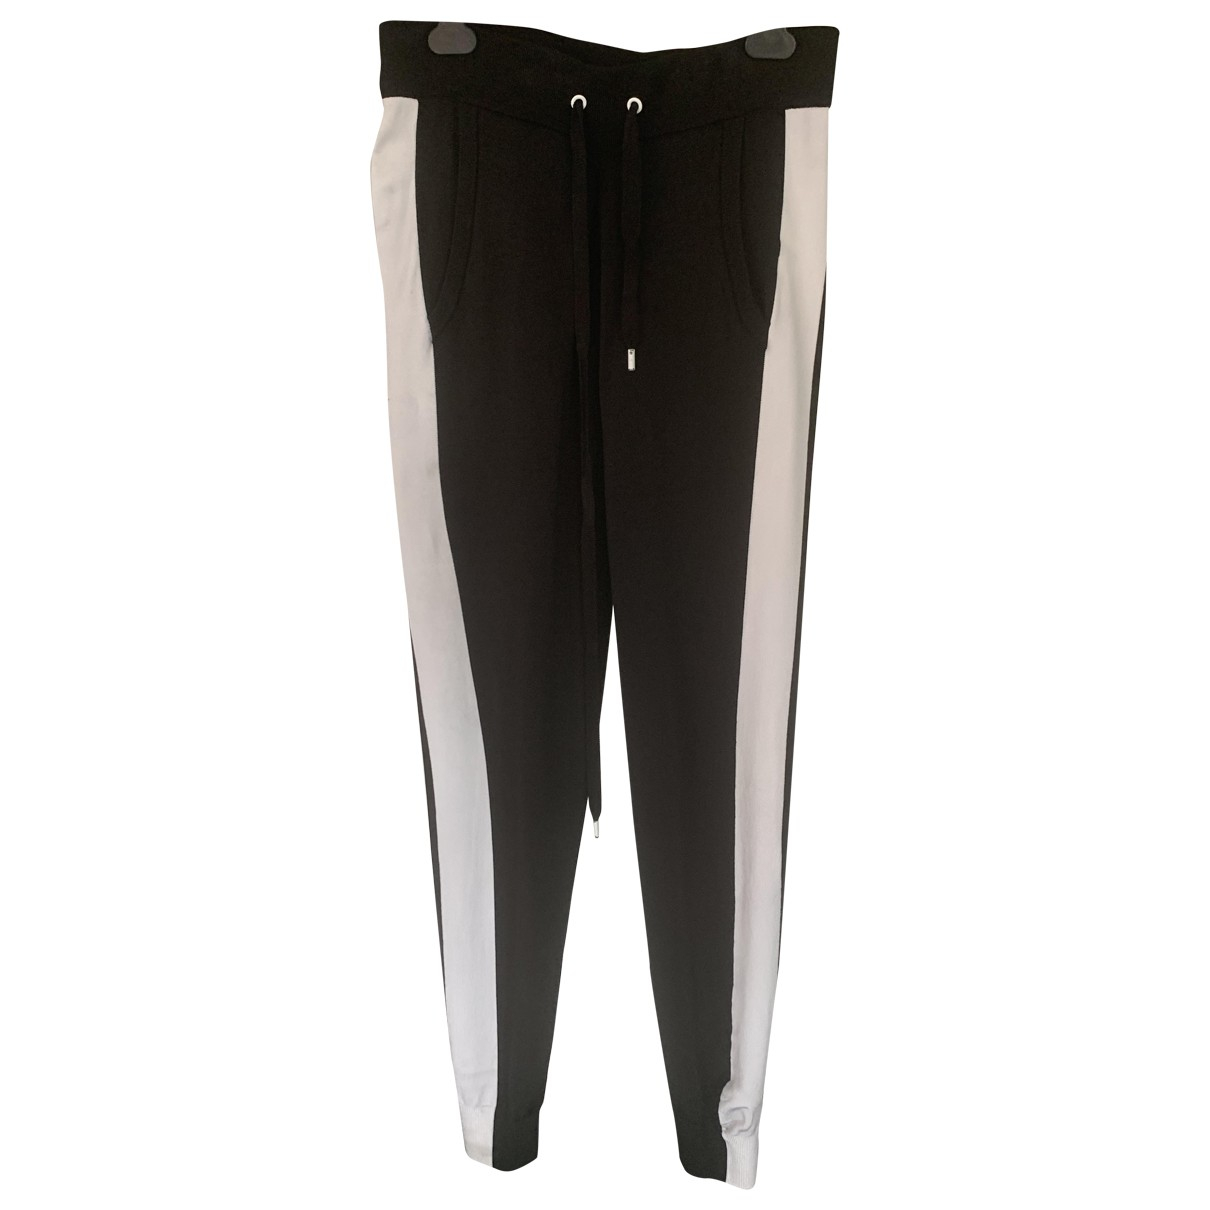 Michael Kors \N Black Trousers for Women 1 US